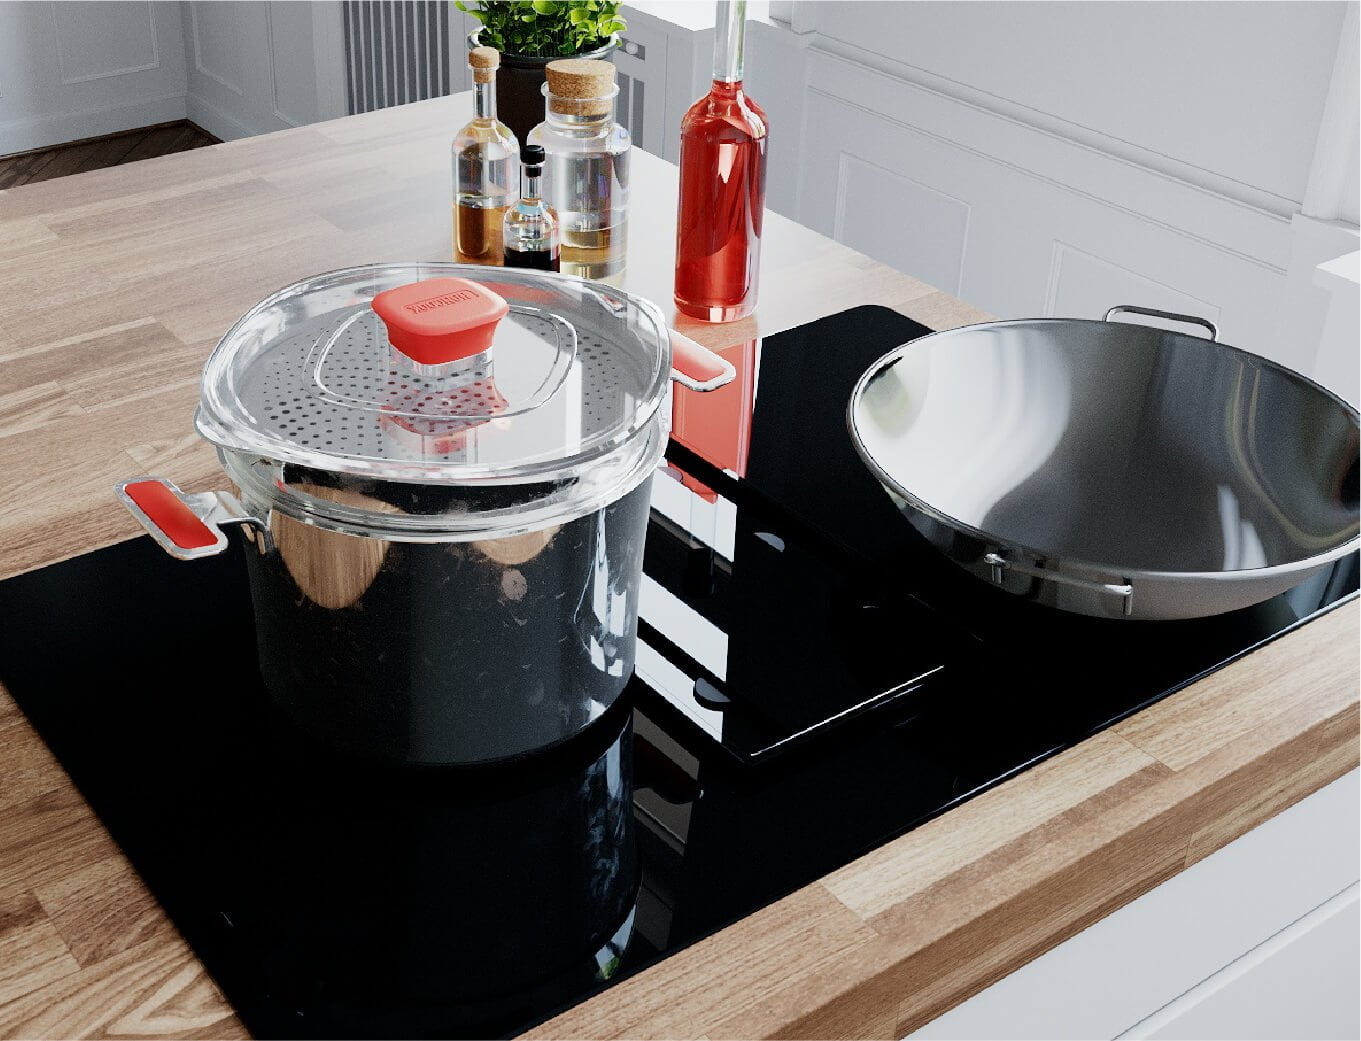 Honcook_Design_Cookware_Branded_Design_Activation_Kitchen